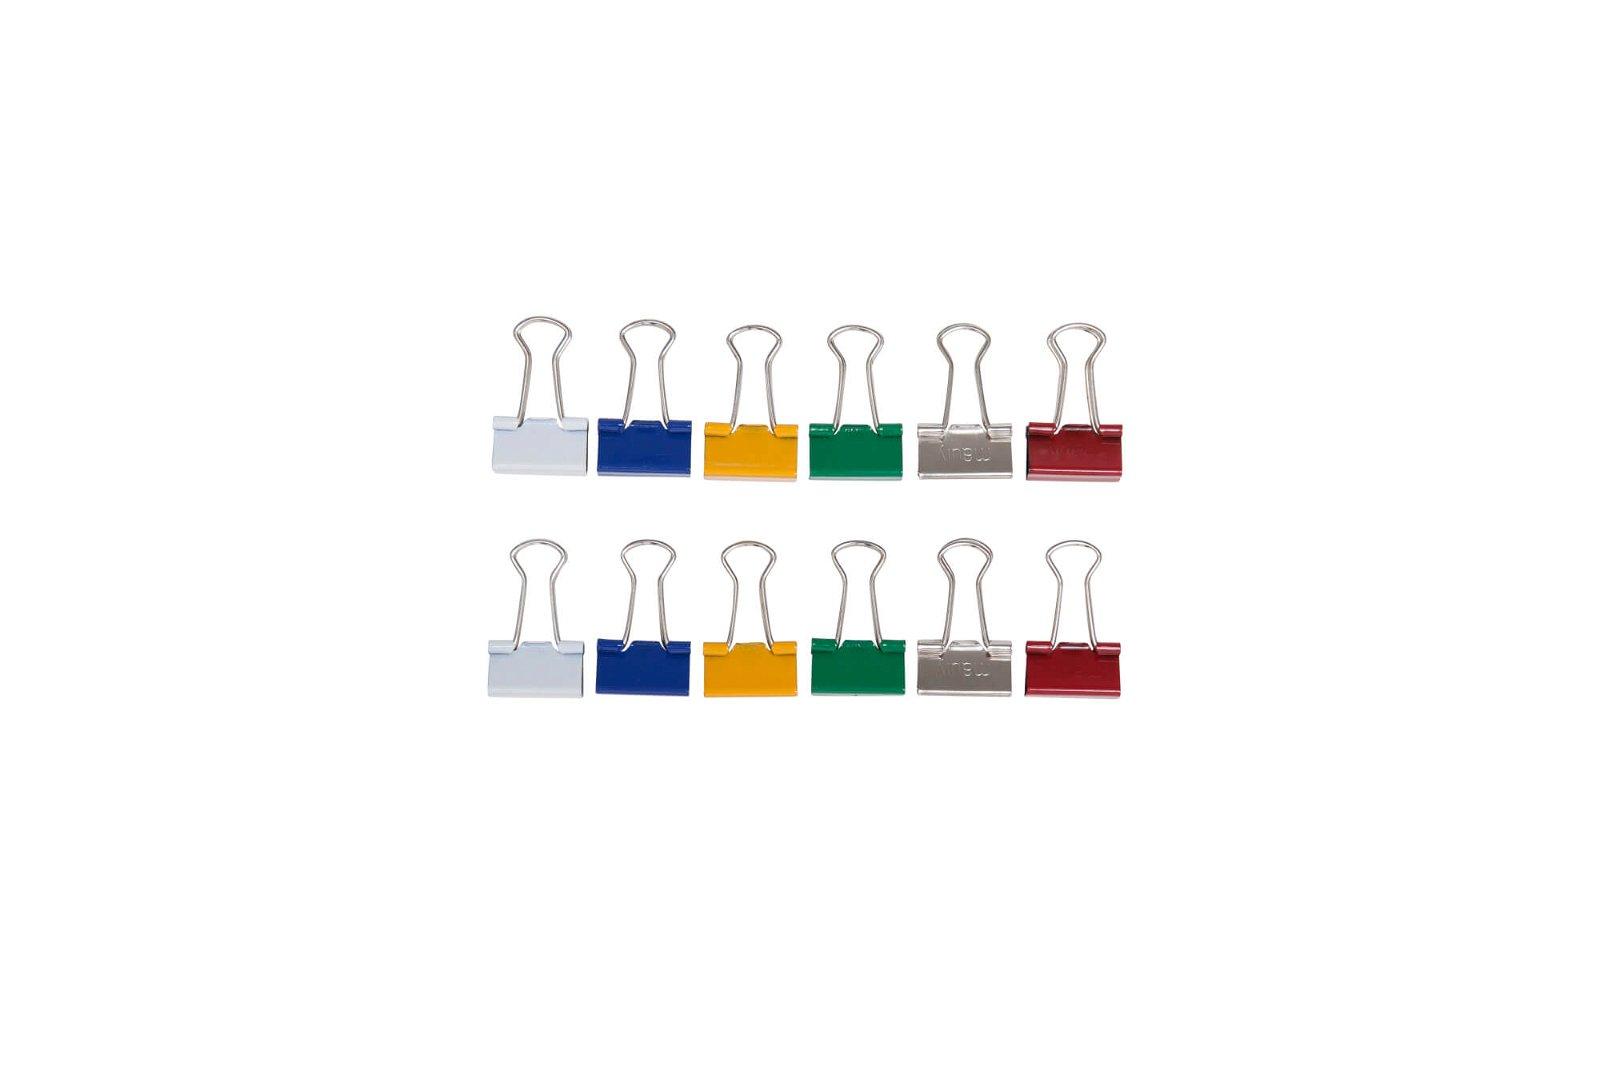 mauly 214, Breite 16 mm, 12 St./Ktn., farbig sortiert